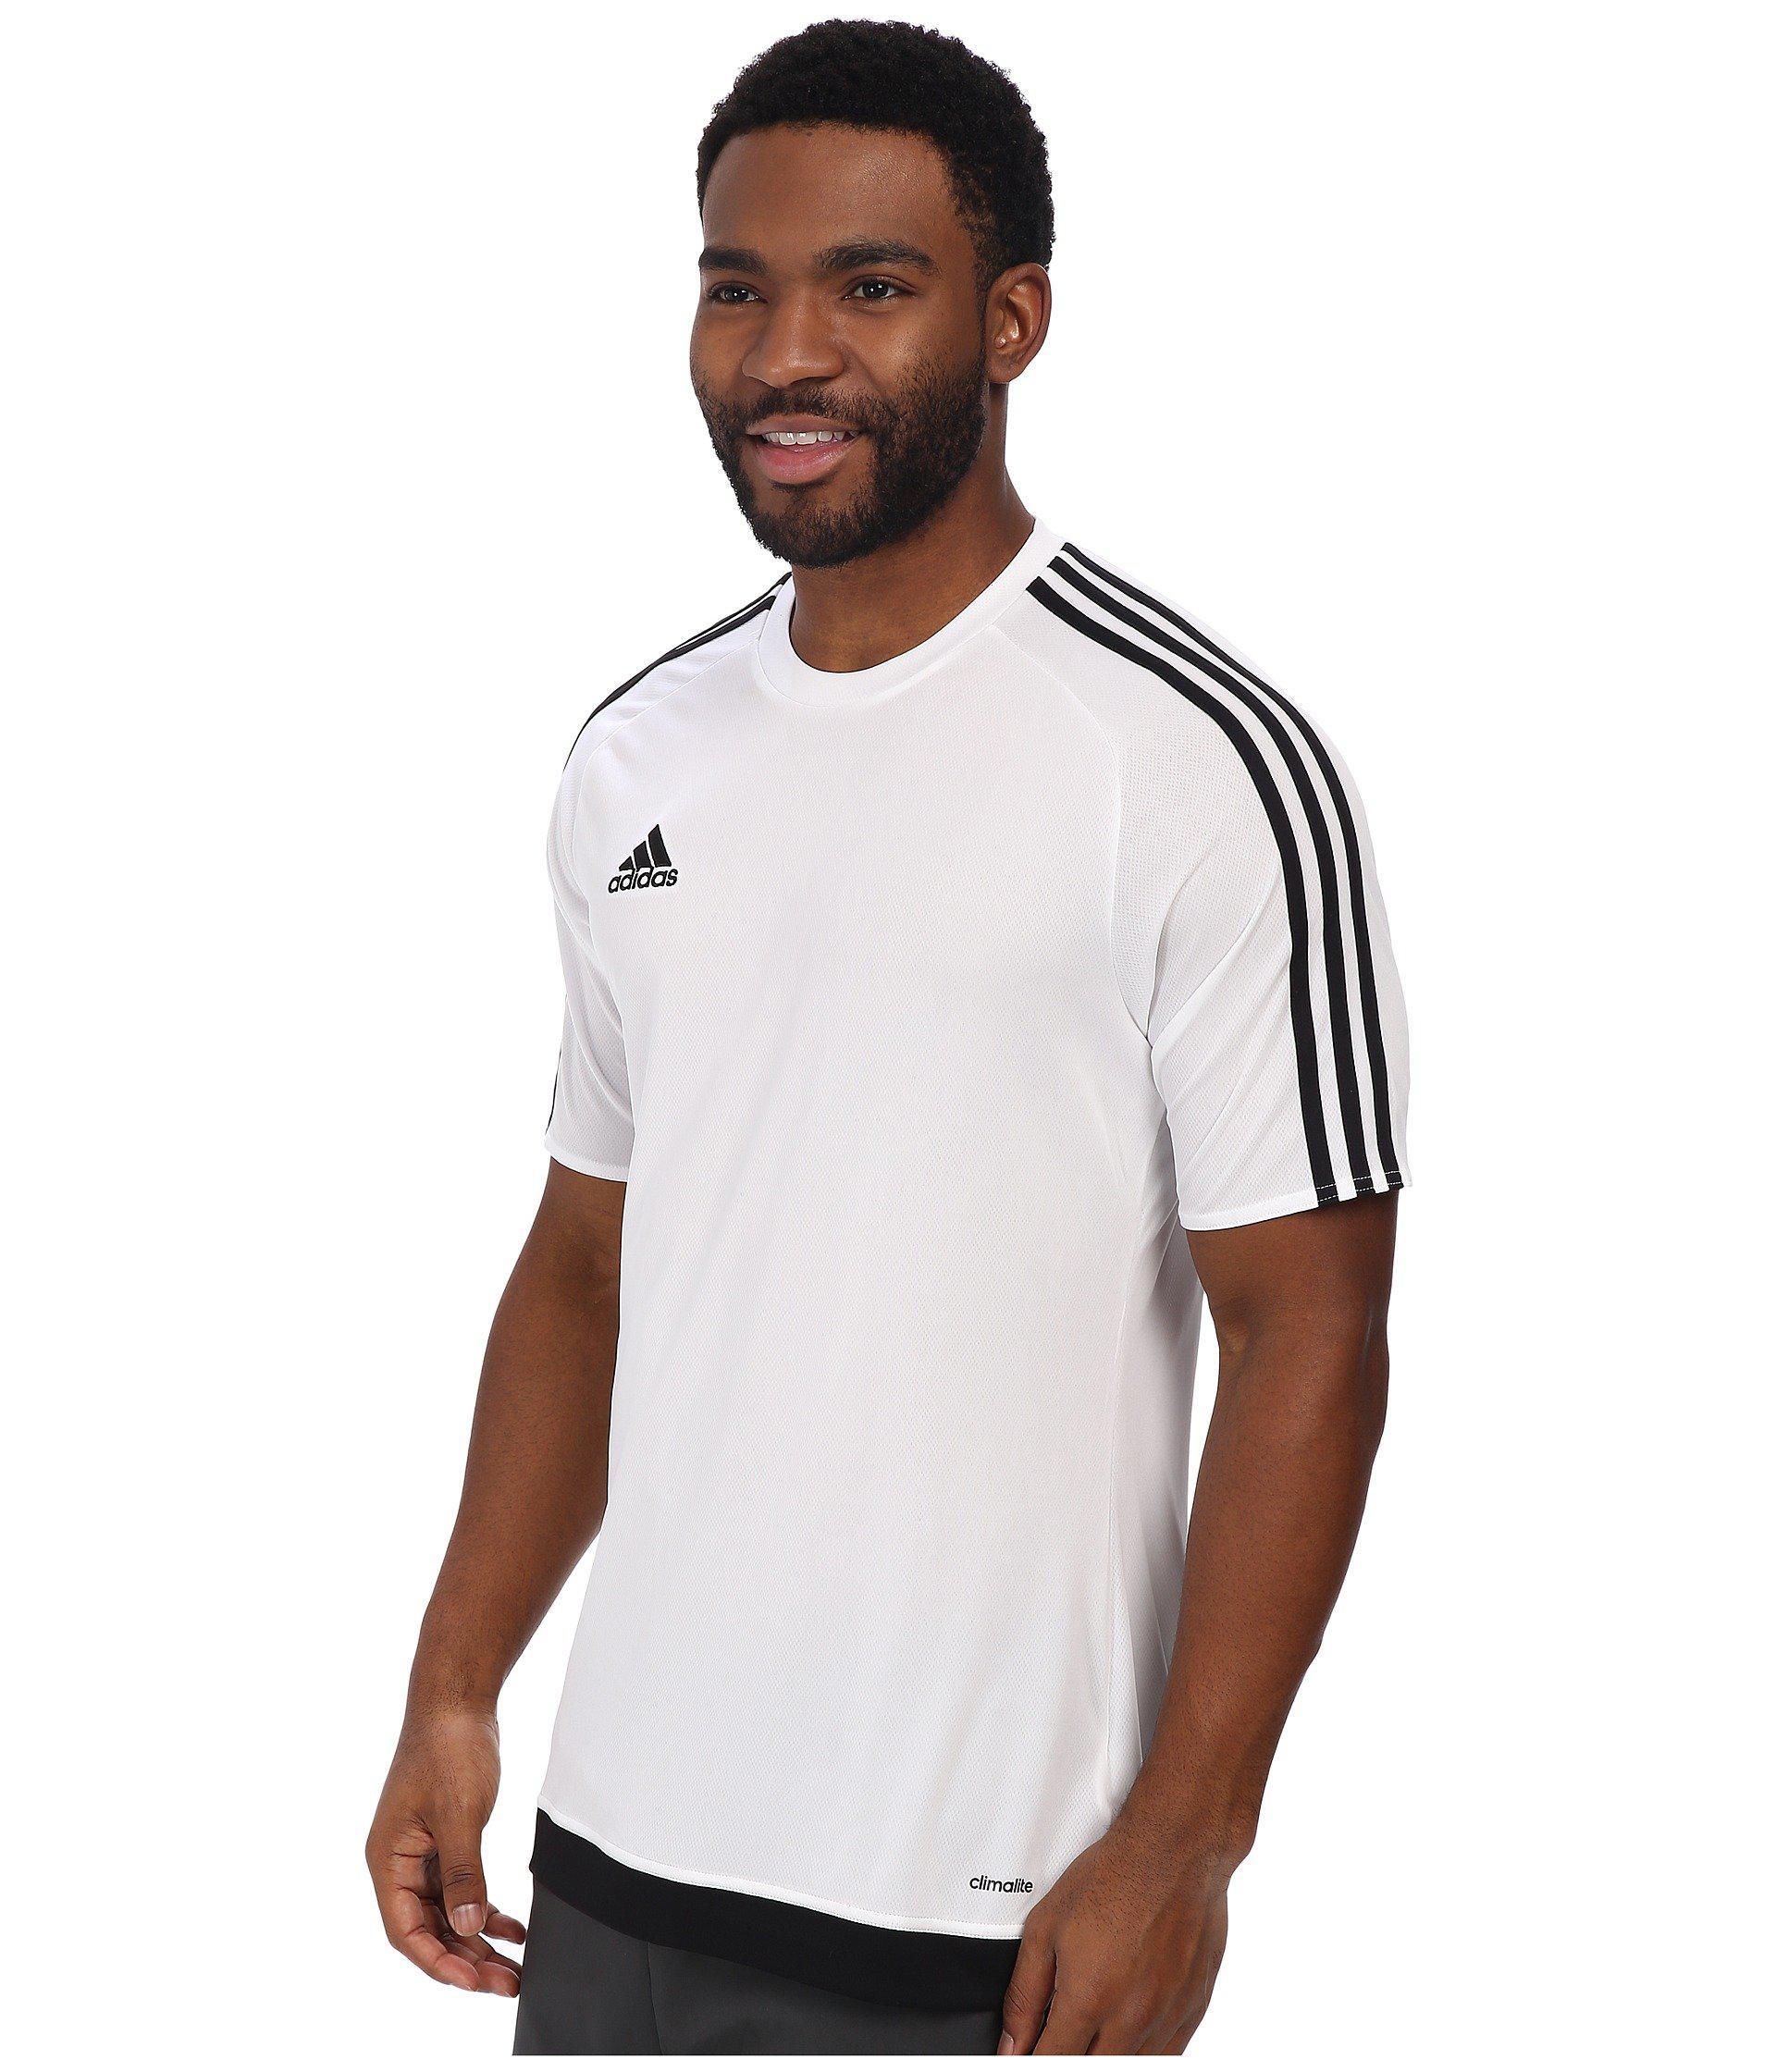 727416104186 Lyst - adidas Estro 15 Jersey in White for Men